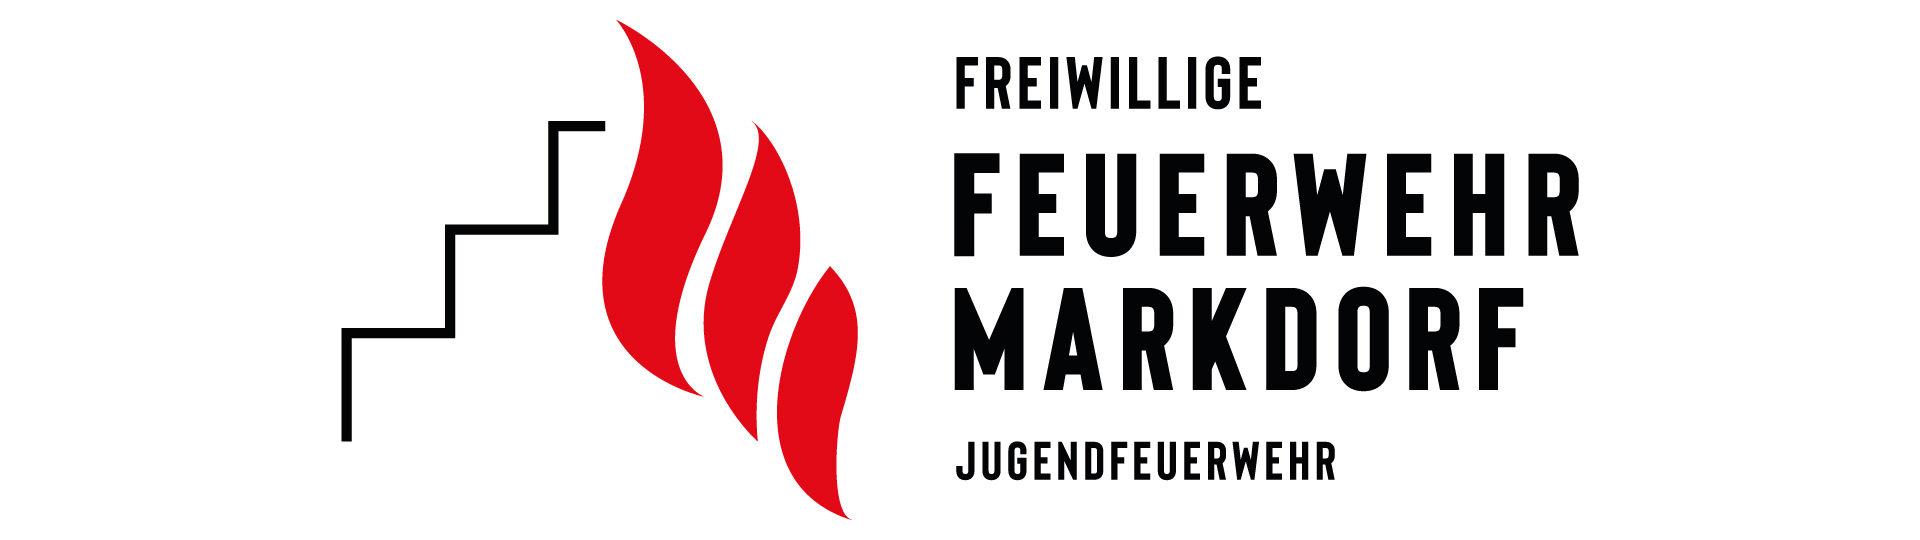 Jugendfeuerwehr Markdorf